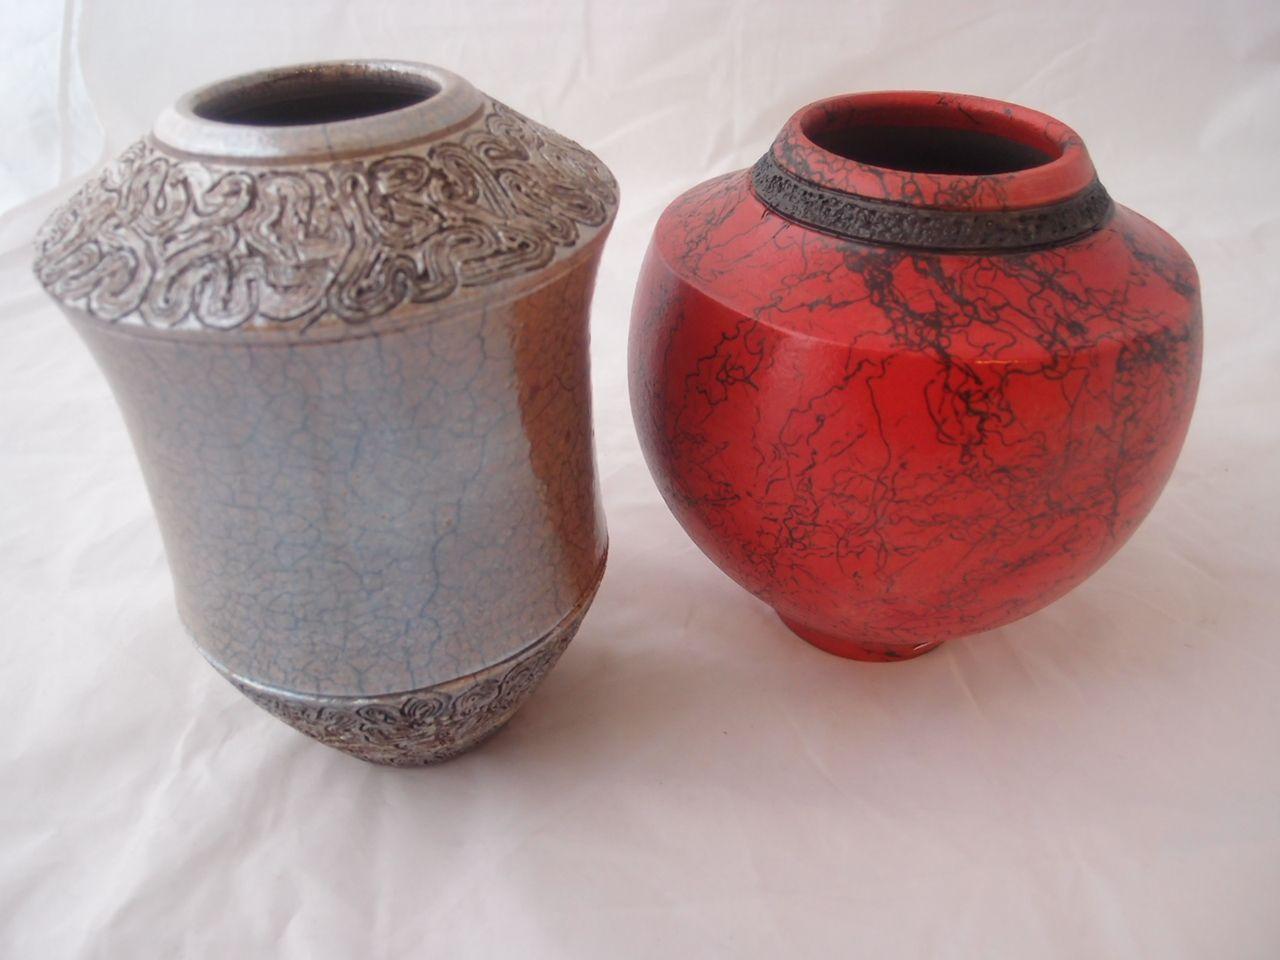 Naked Raku - Keramikatelier im Rank